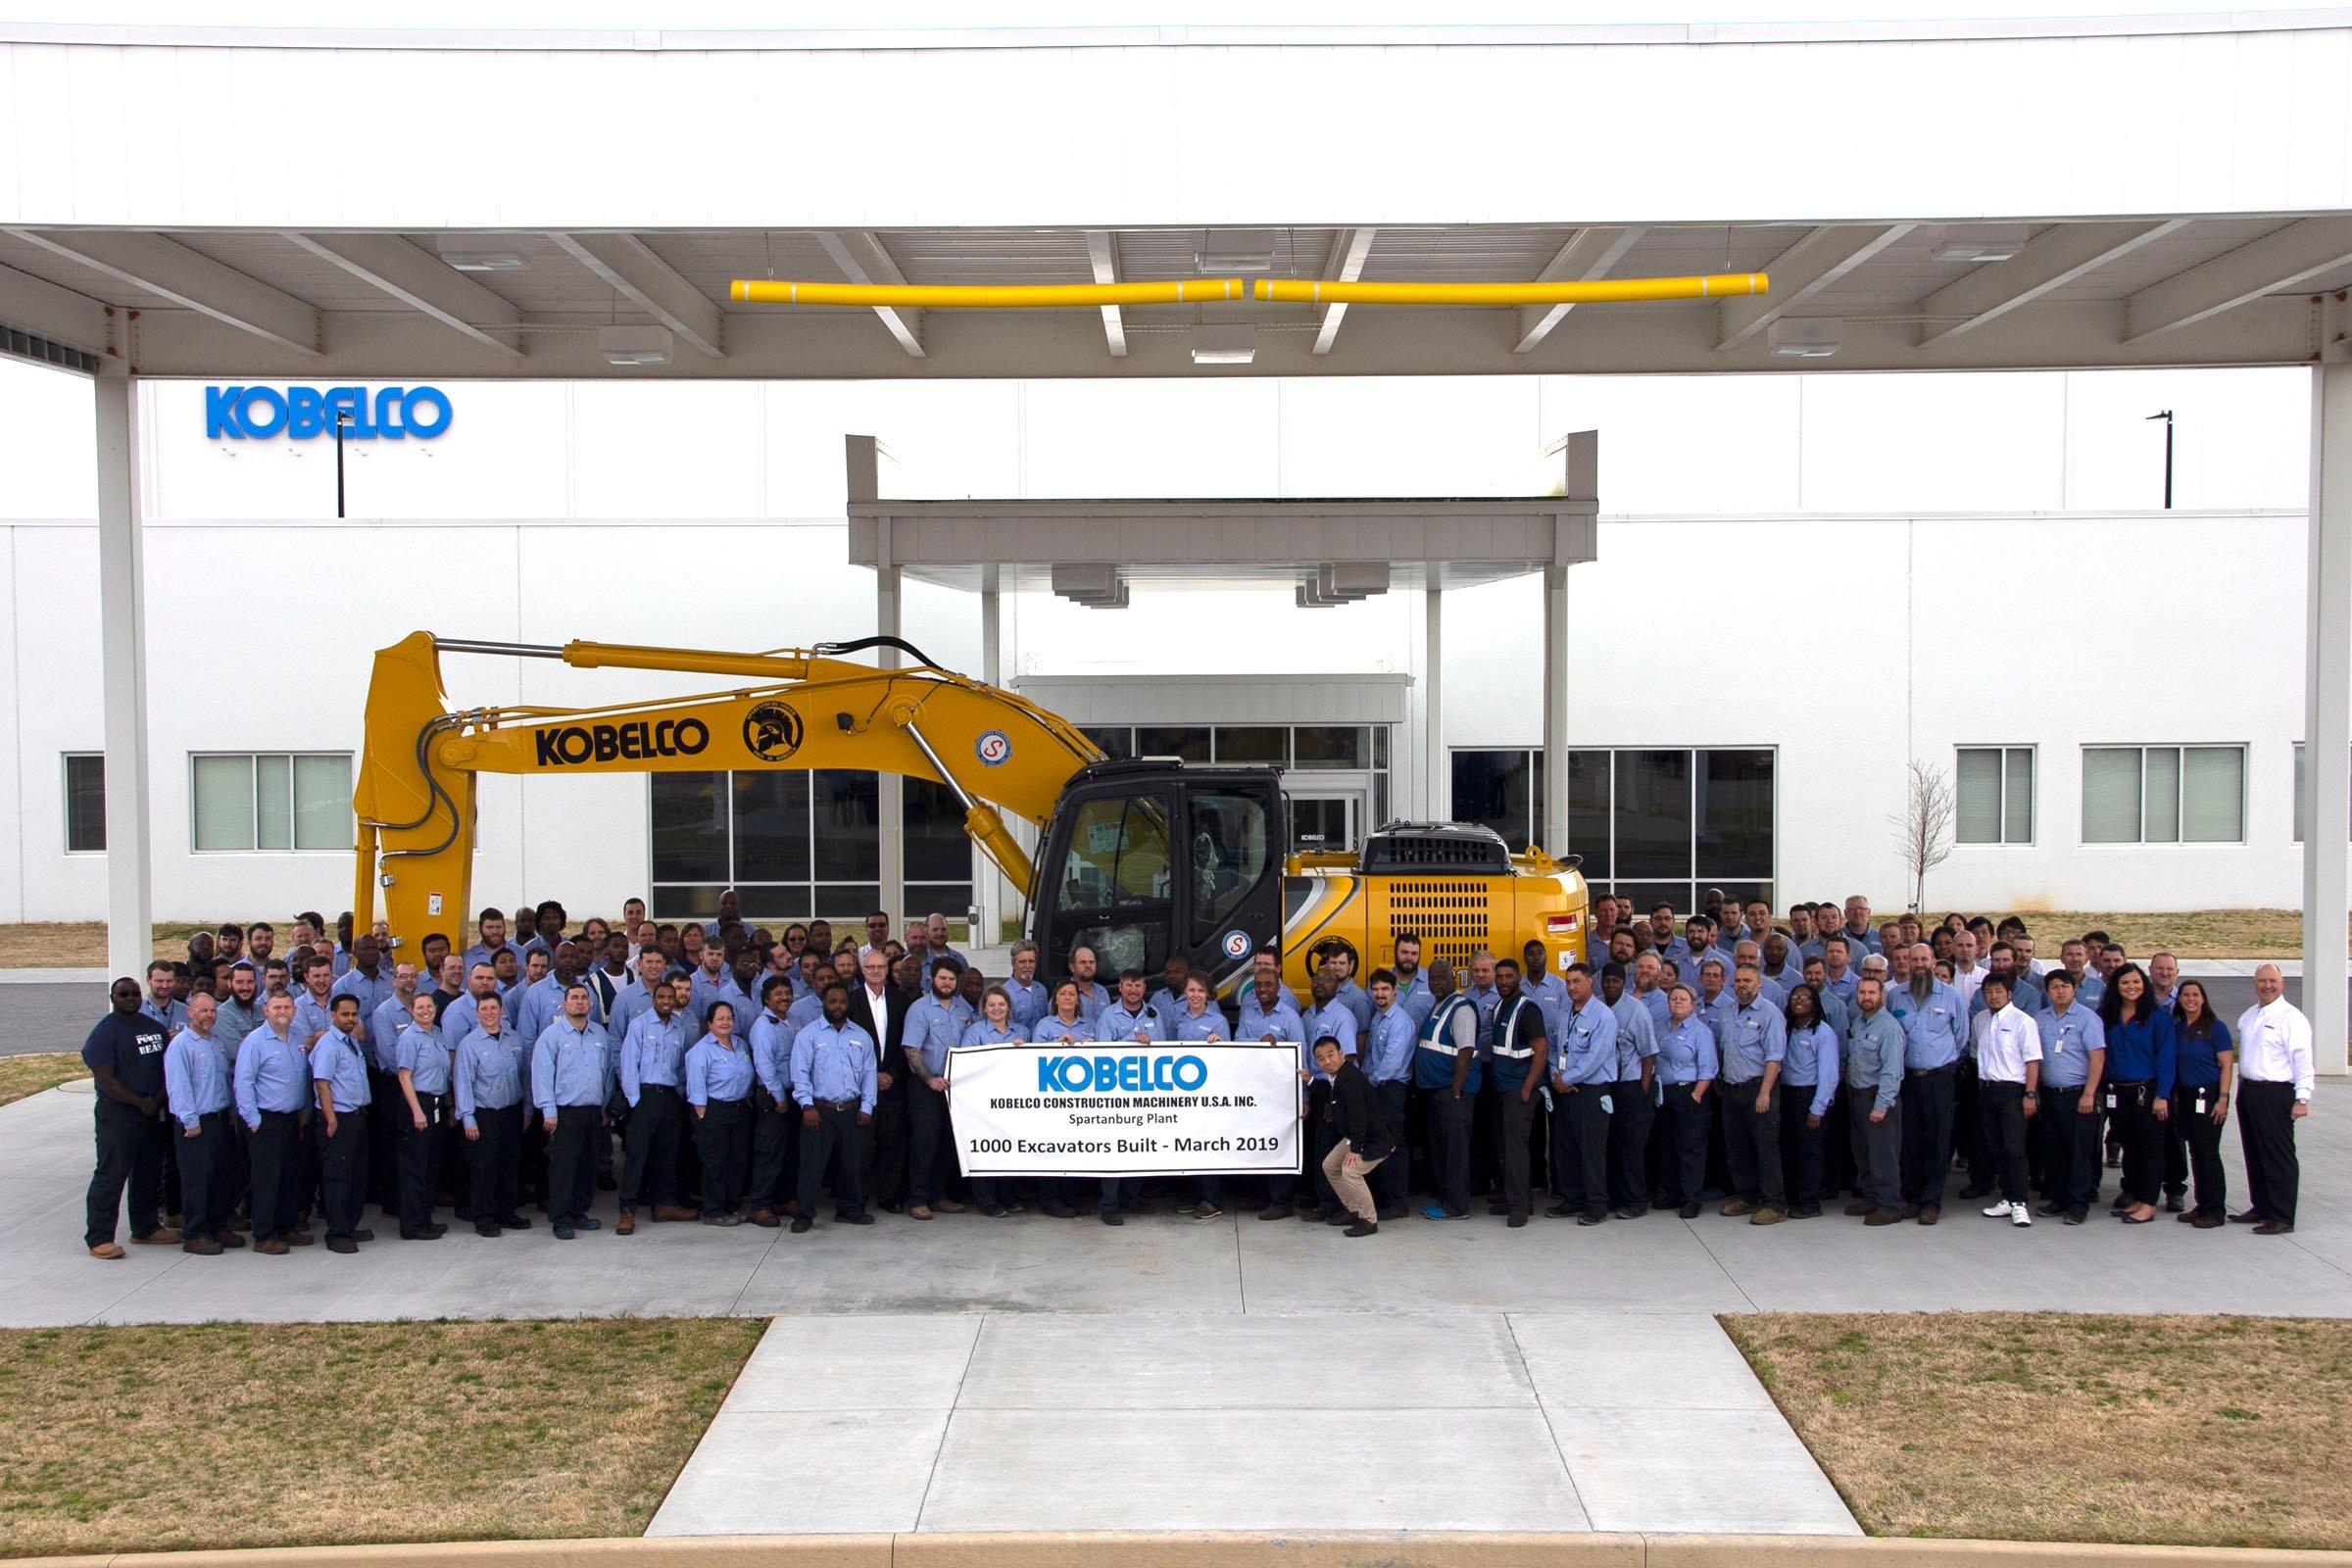 KOBELCO Celebrates Production Of 1000th Excavator At USA